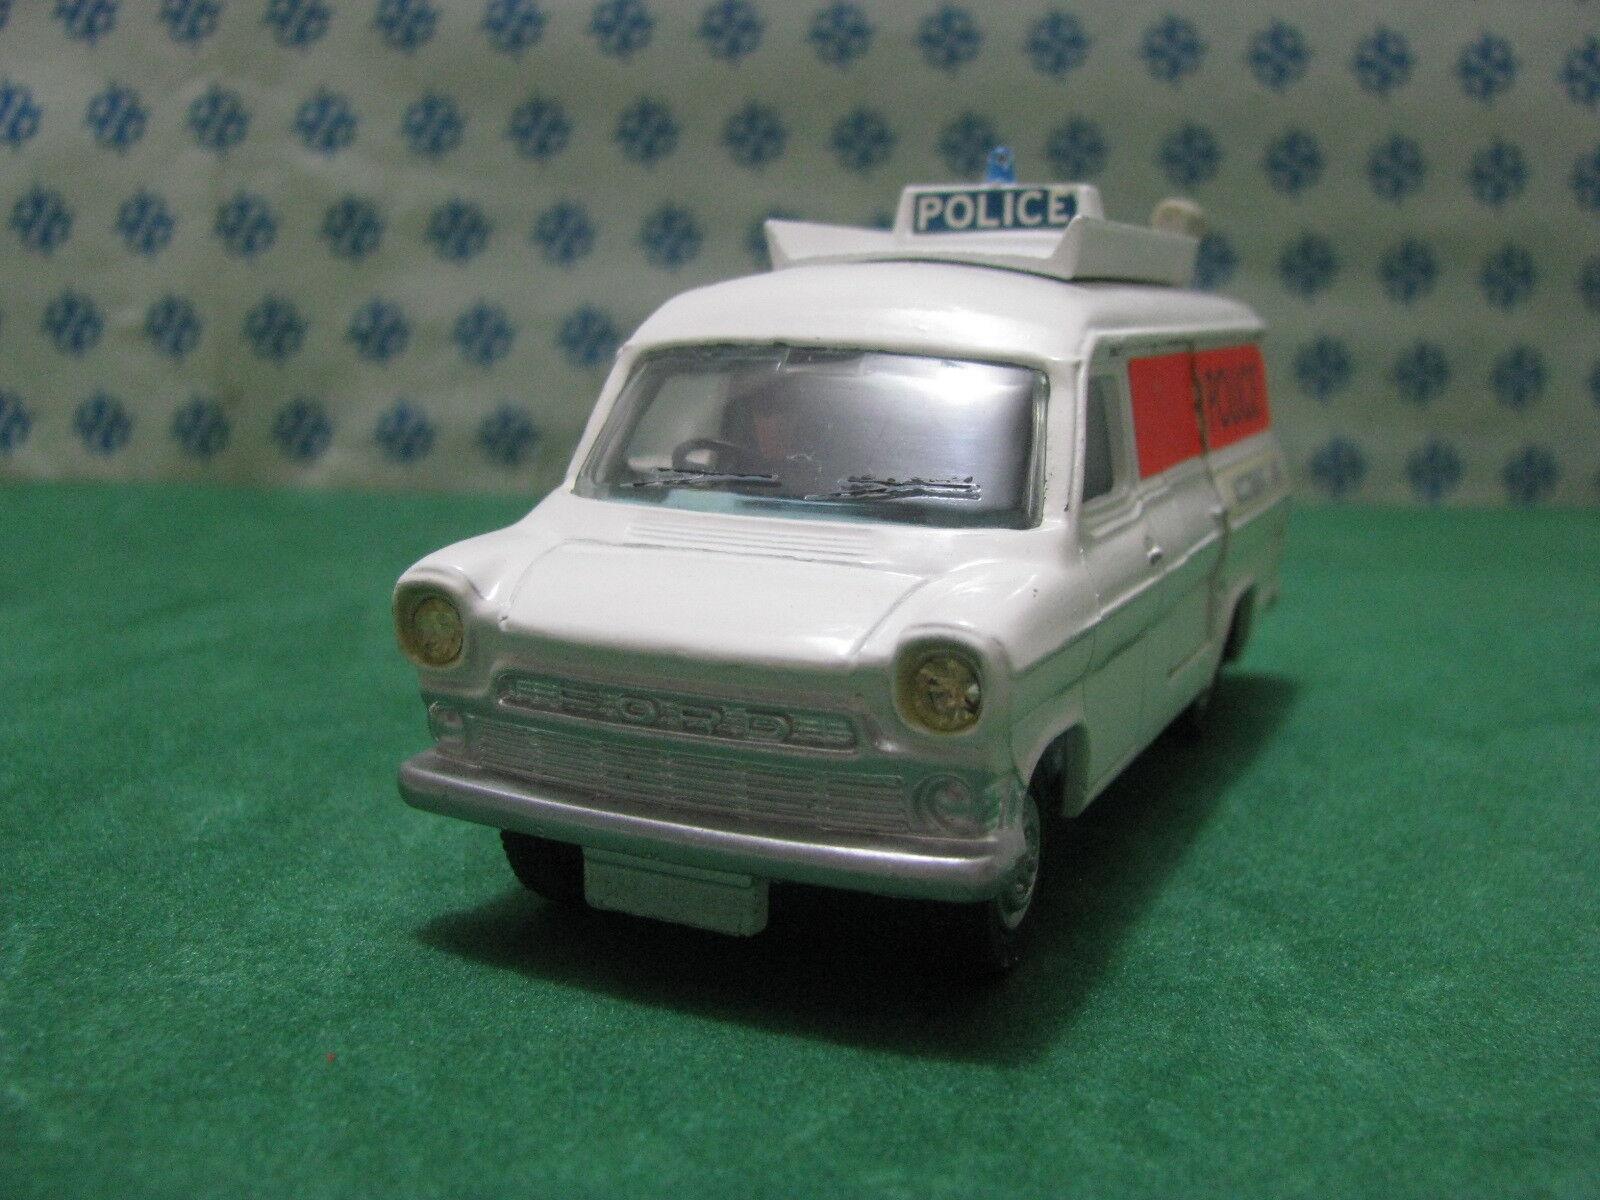 Vintage - - - Ford Transit Aid Road - 1 43 Dinky Supertoys 287 1c283d